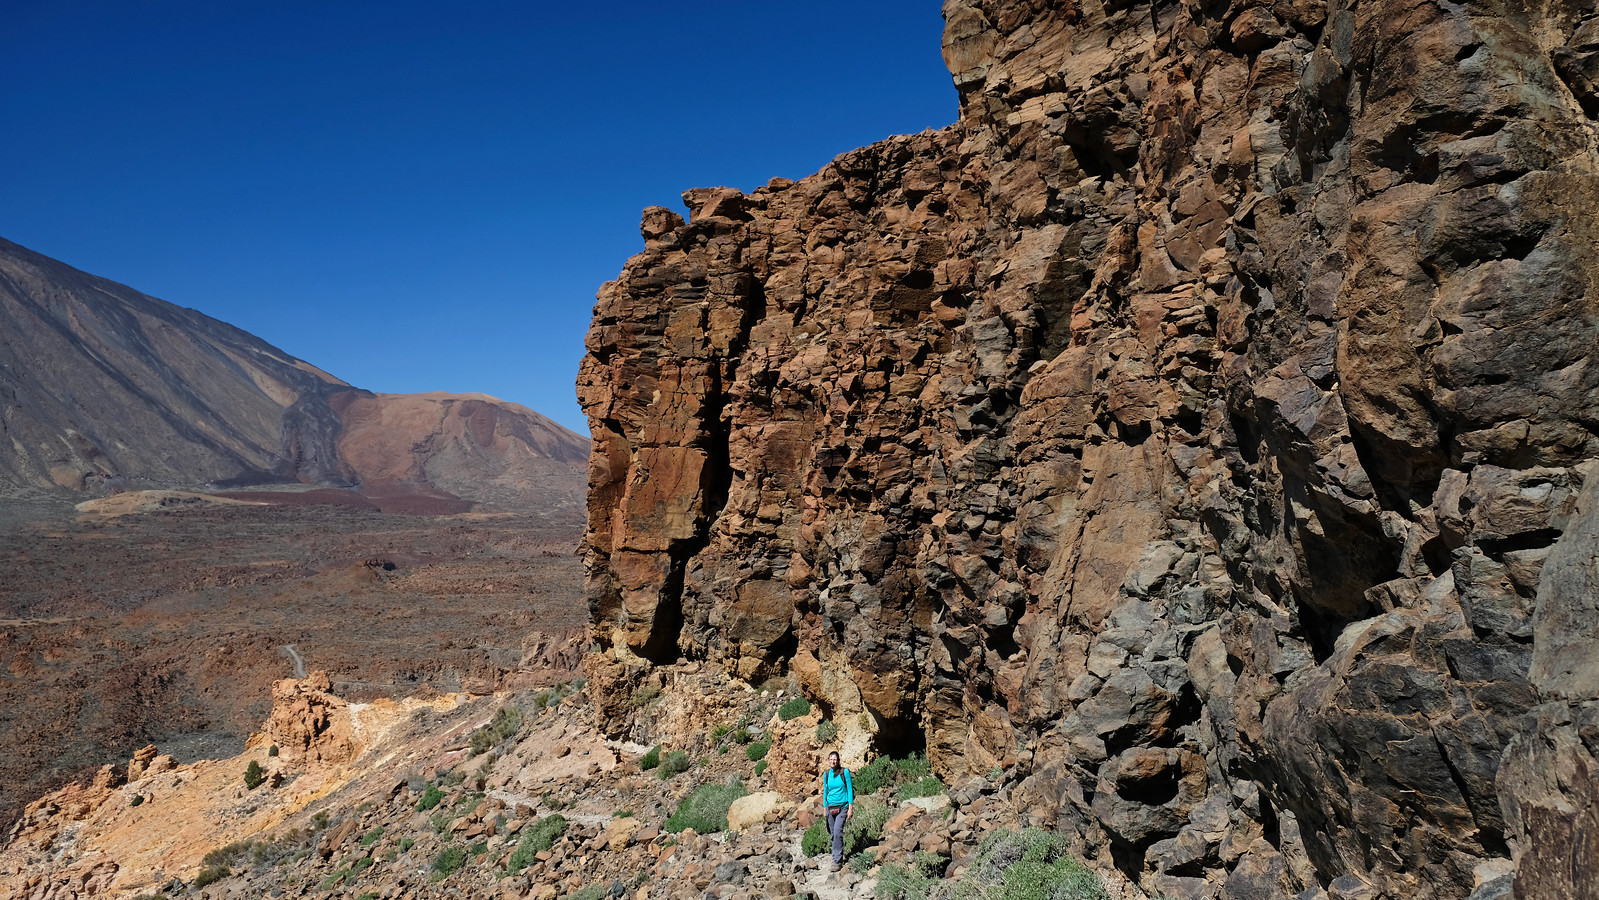 Montaña Guajara Circuit, Teide National Park, Tenerife, Spain